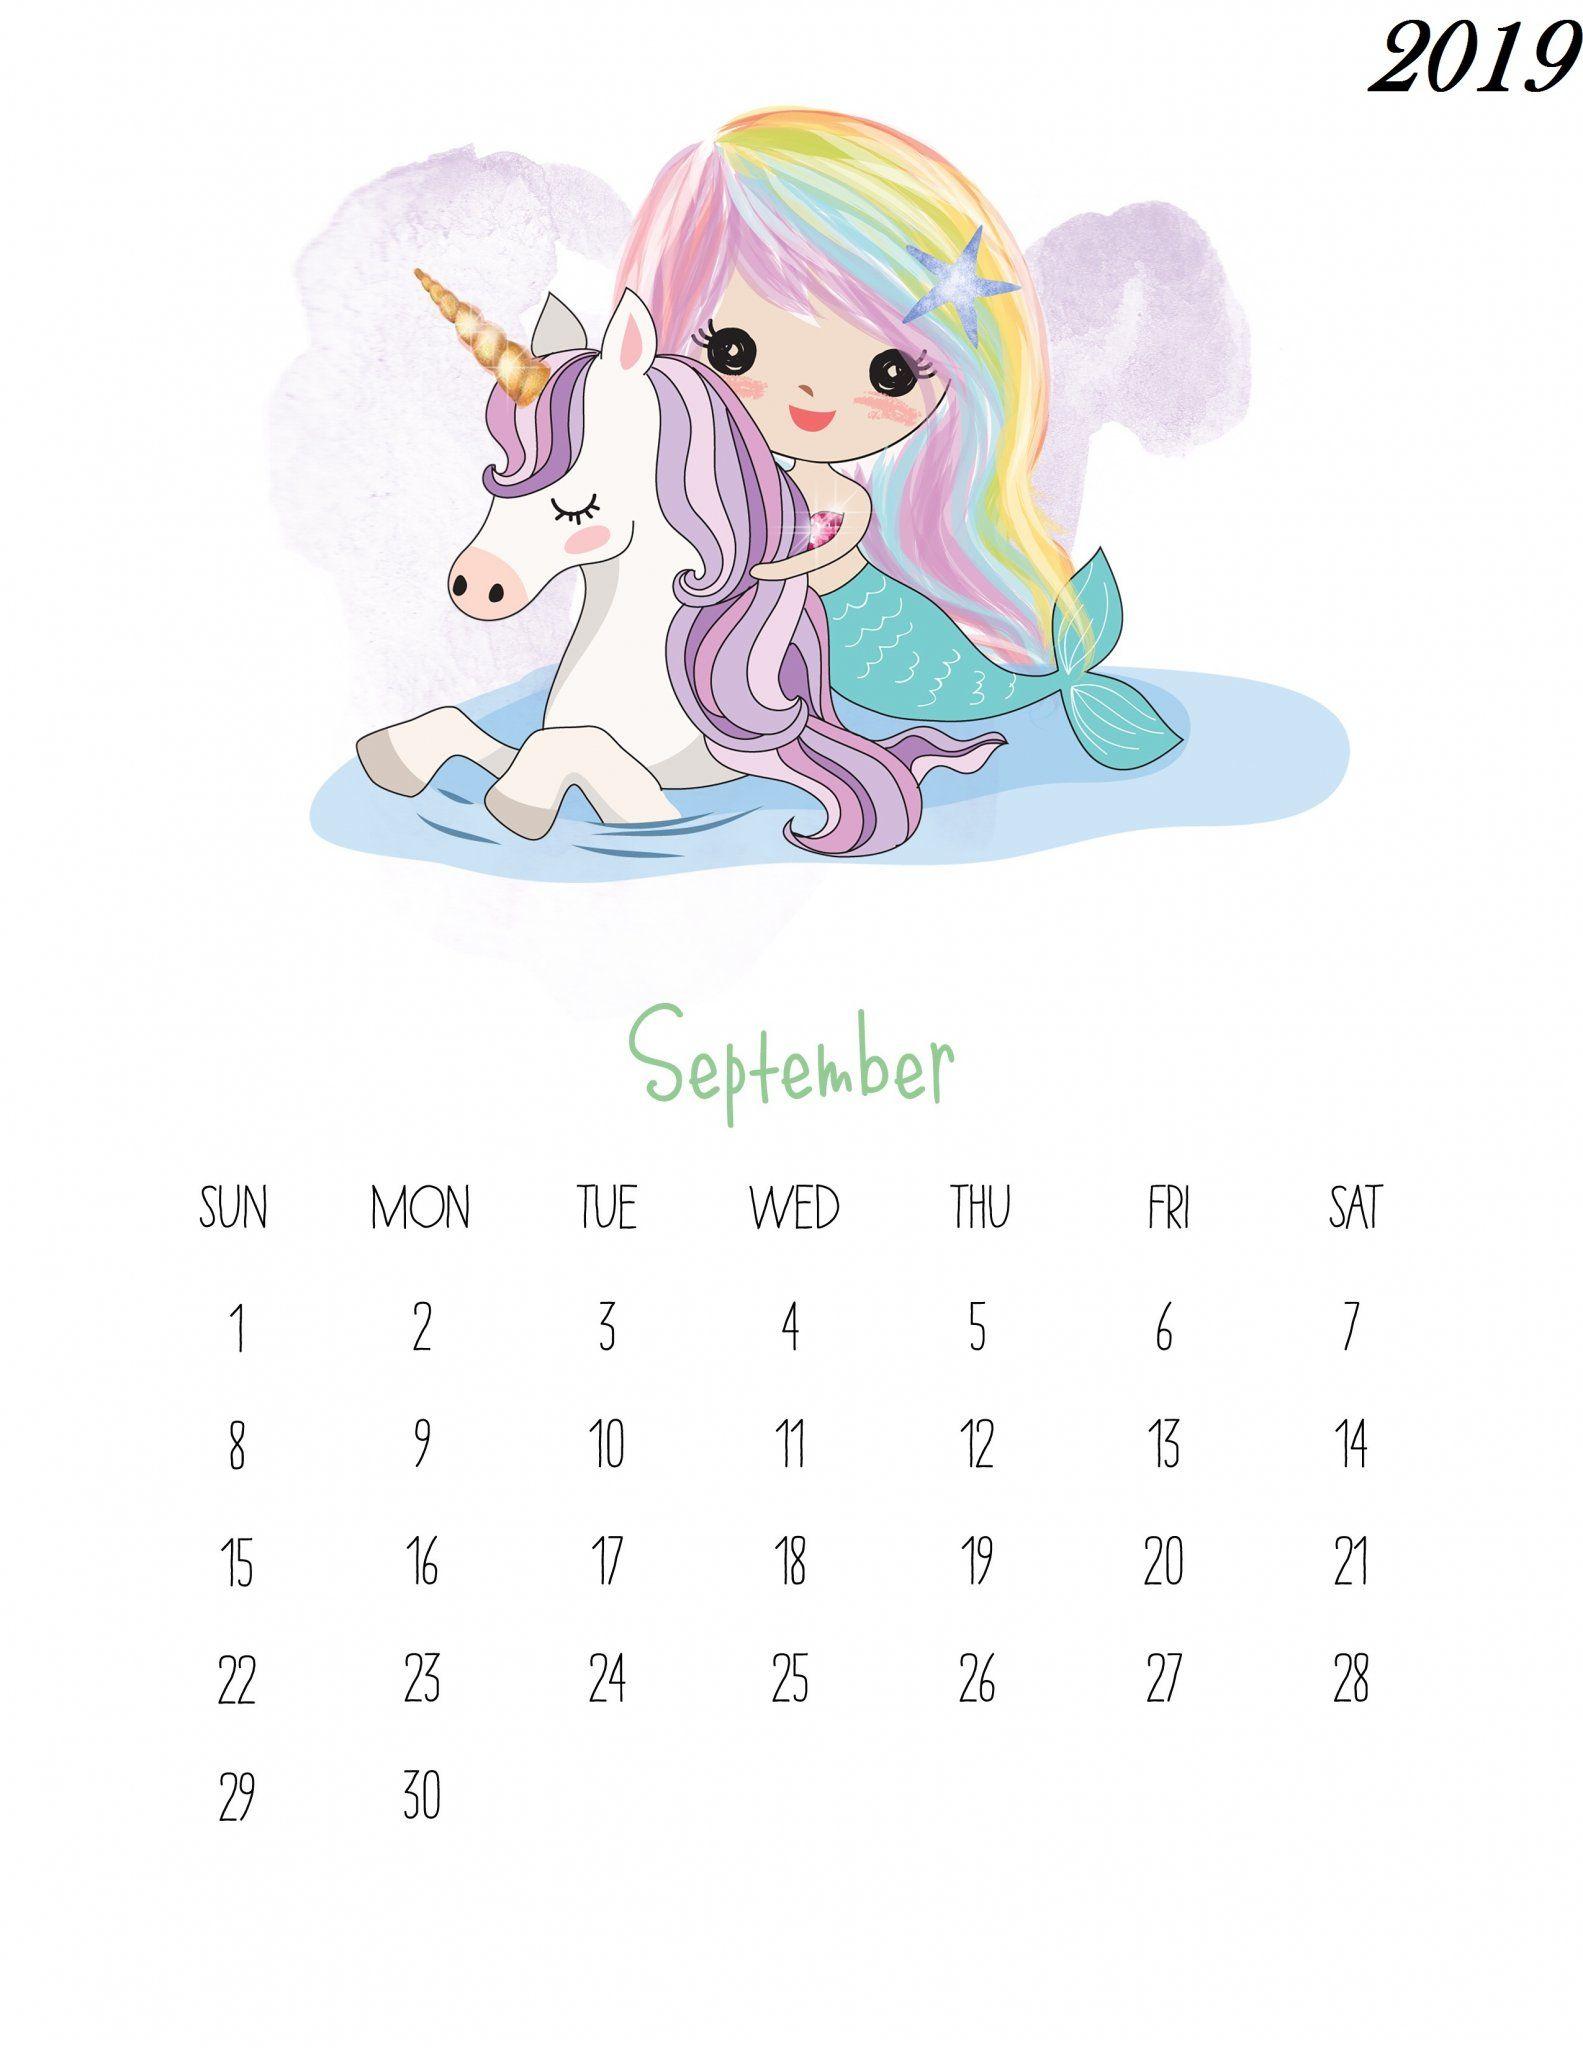 Kawaii Calendar 2019 September October And December Free Printable September 2019 Kids Calendar | 250+ 2019 Calendars